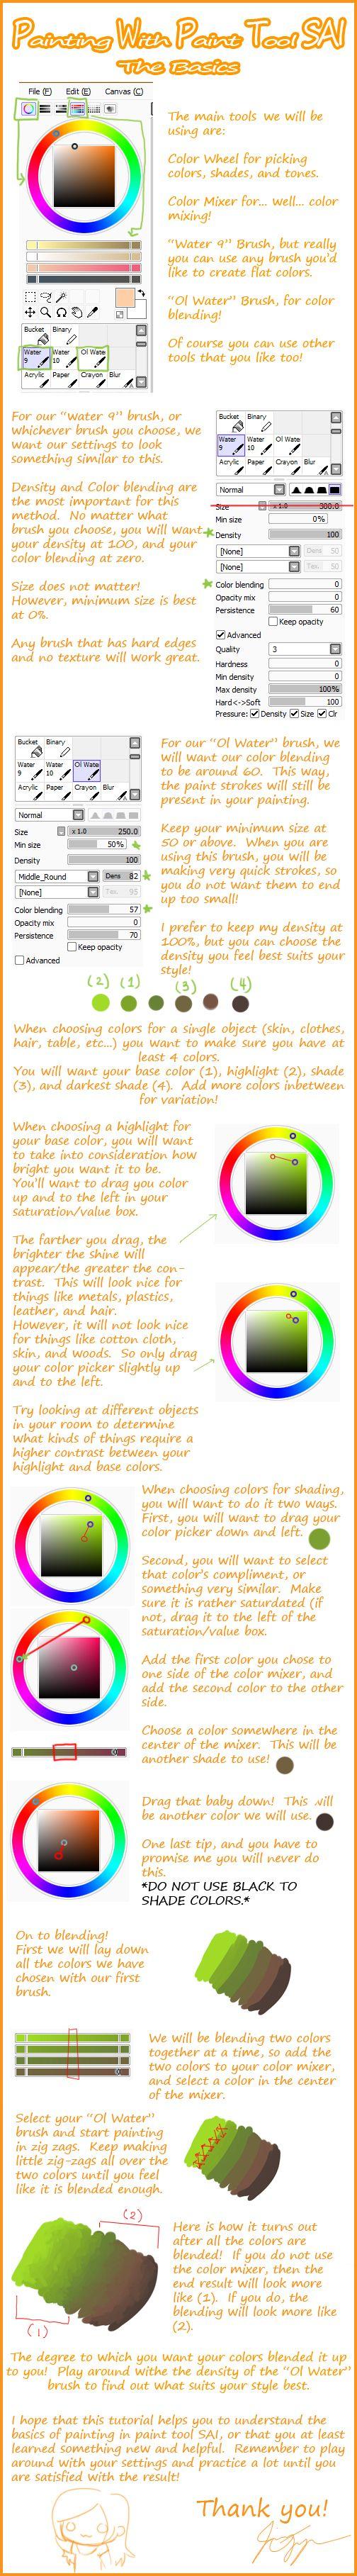 Logiciel de dessin paint tool sai